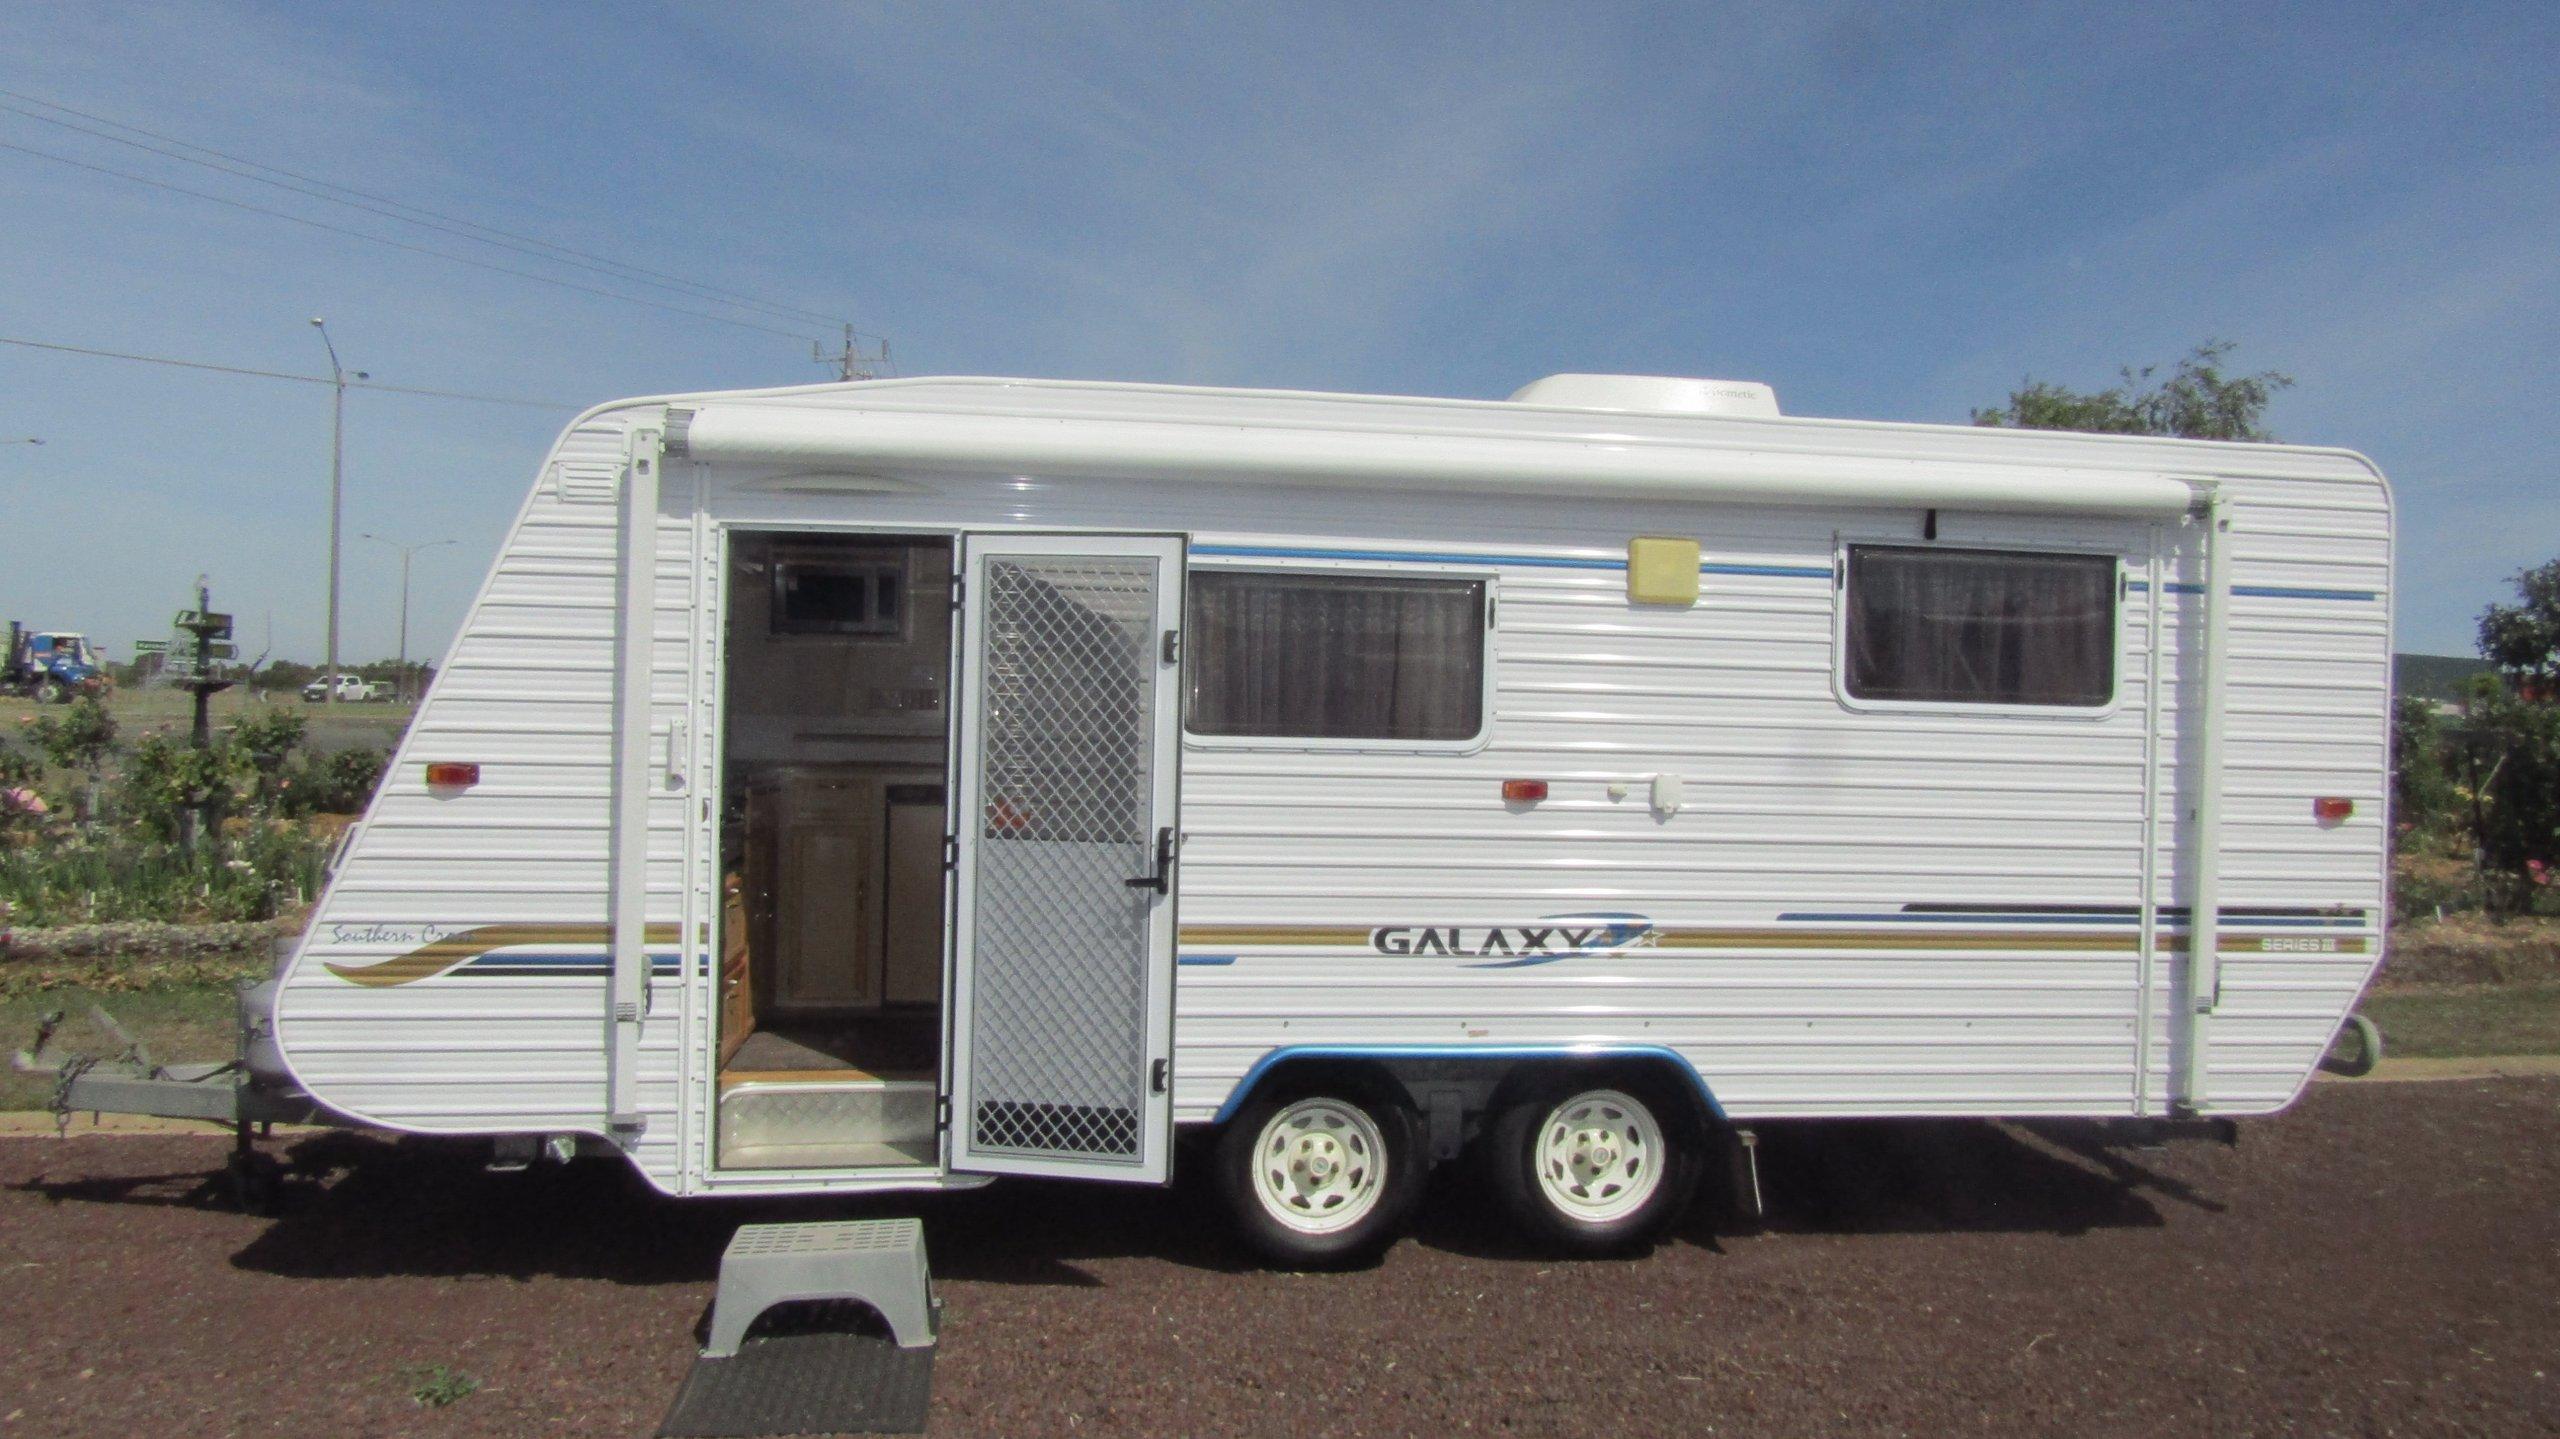 Donehues Leisure Galaxy Southern Cross Caravan Ensuite bathroom Hamilton 12450 IMG 1771